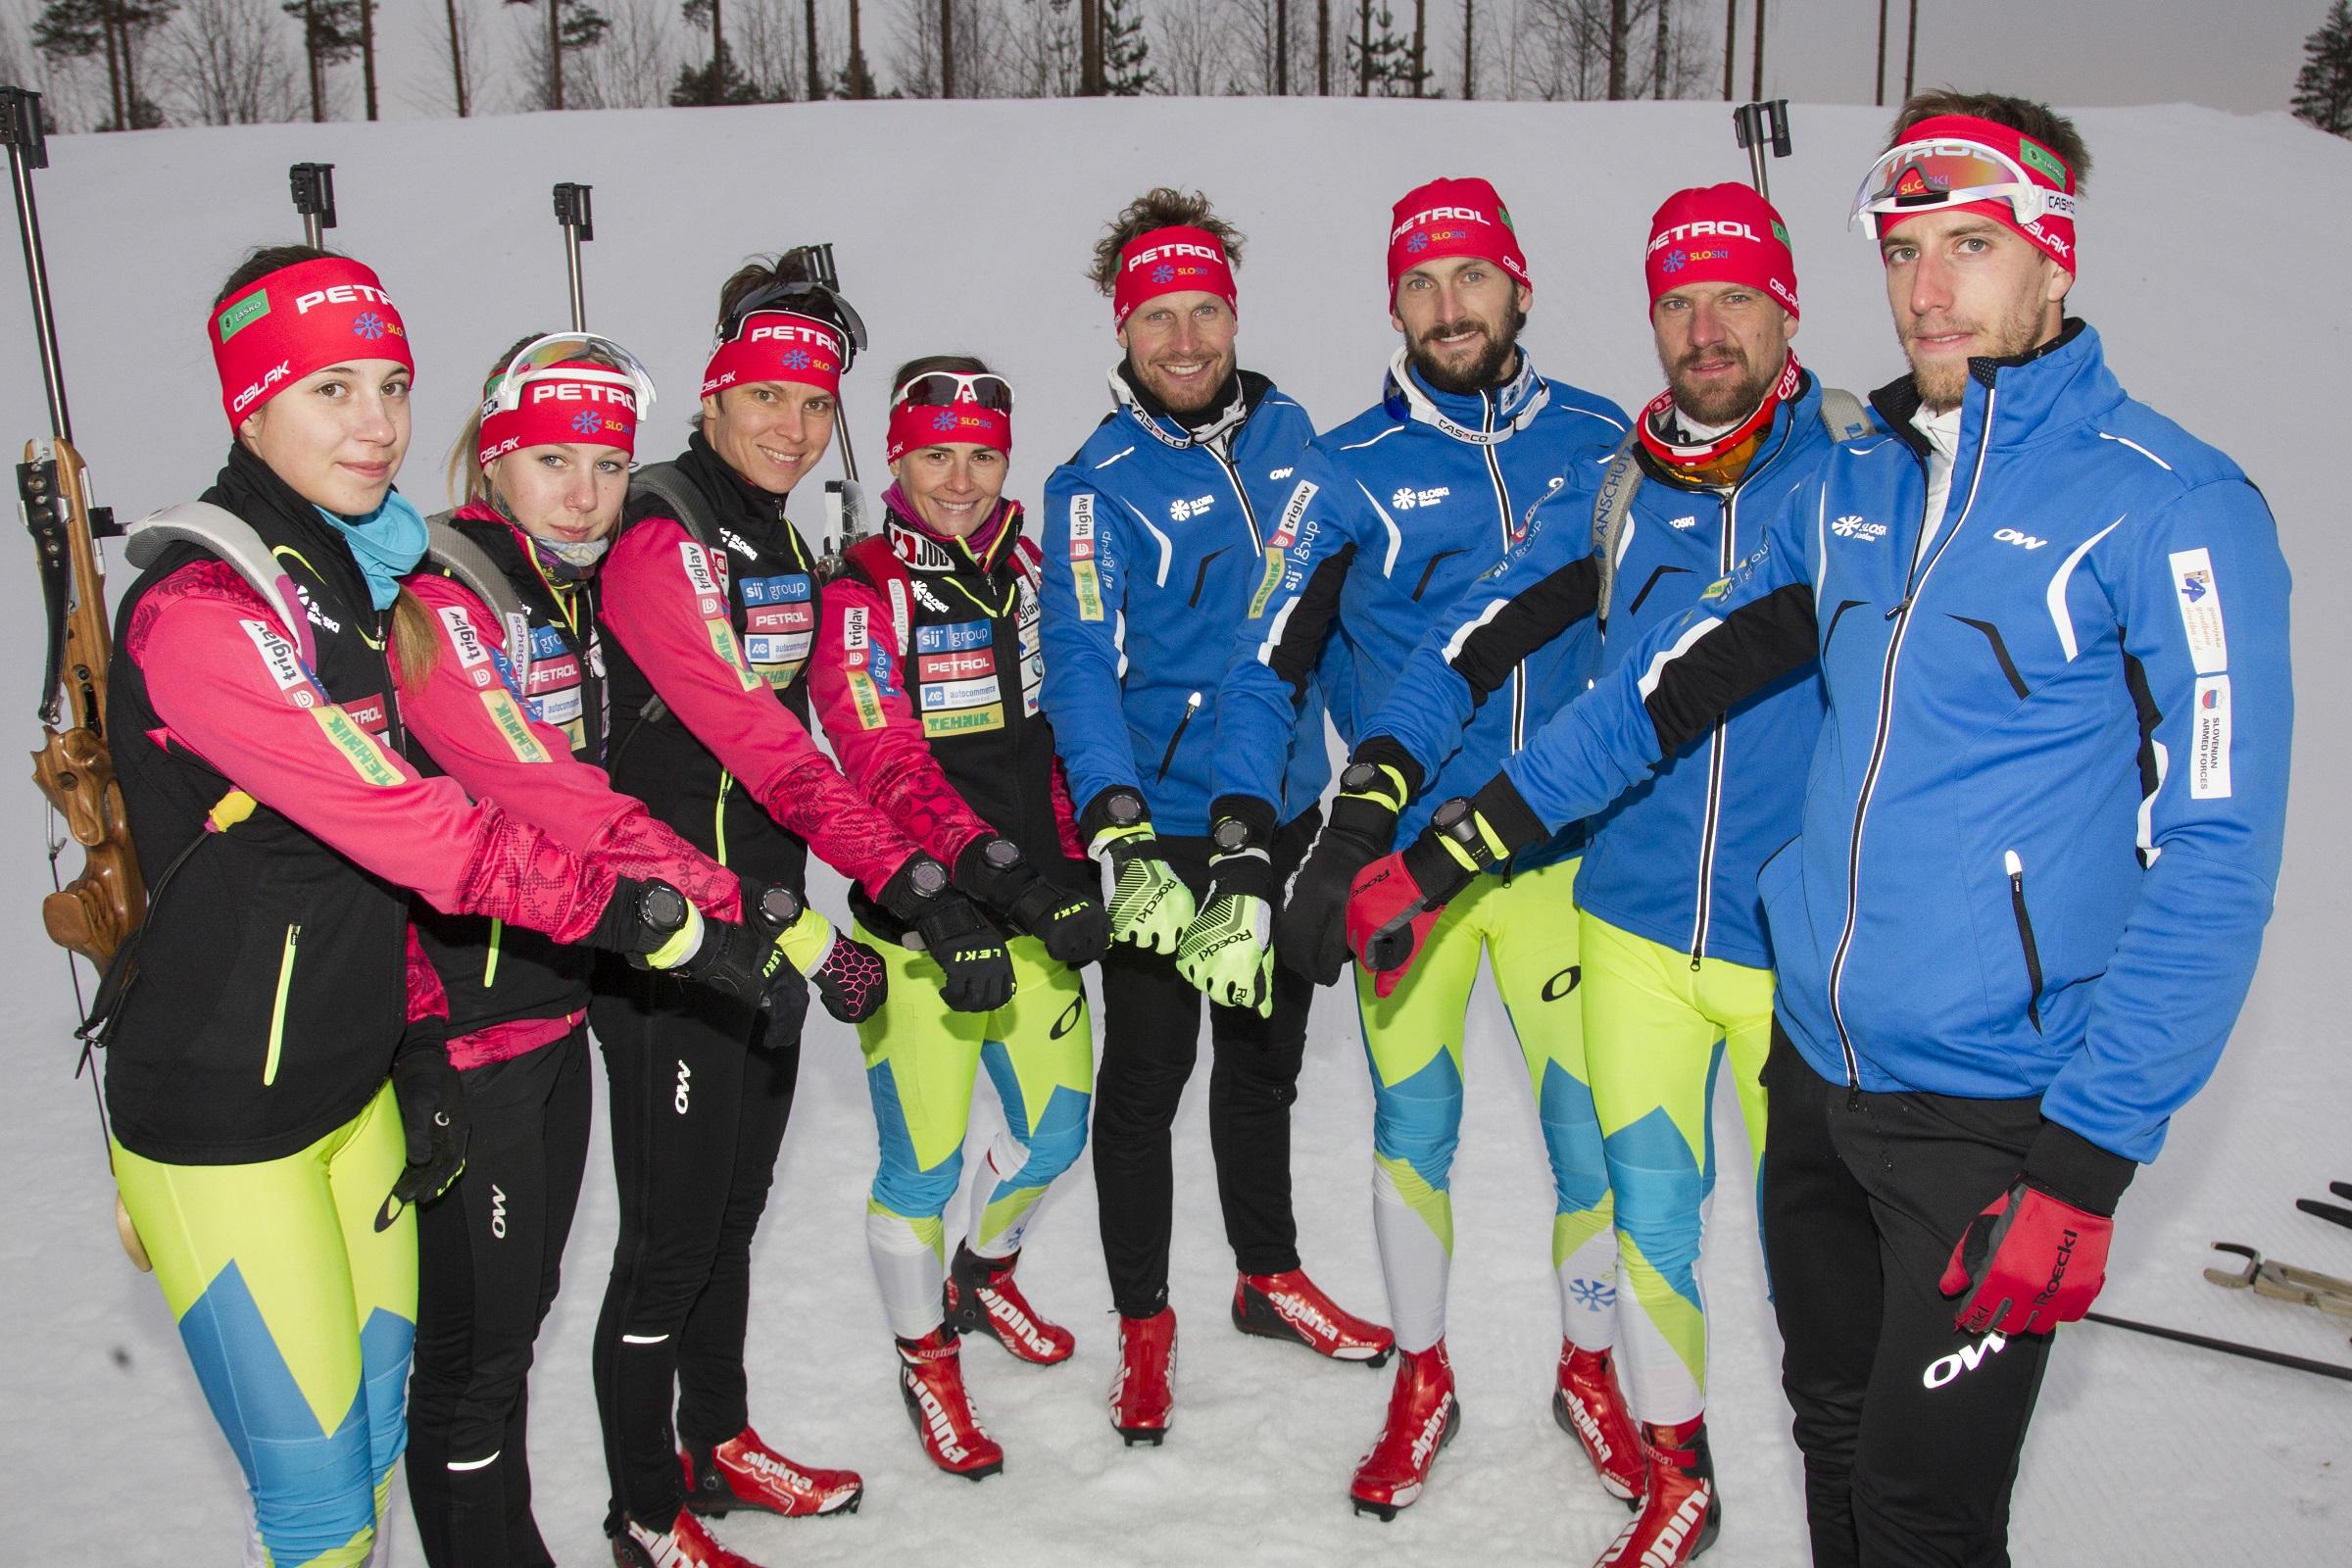 Slovenski biatlonci